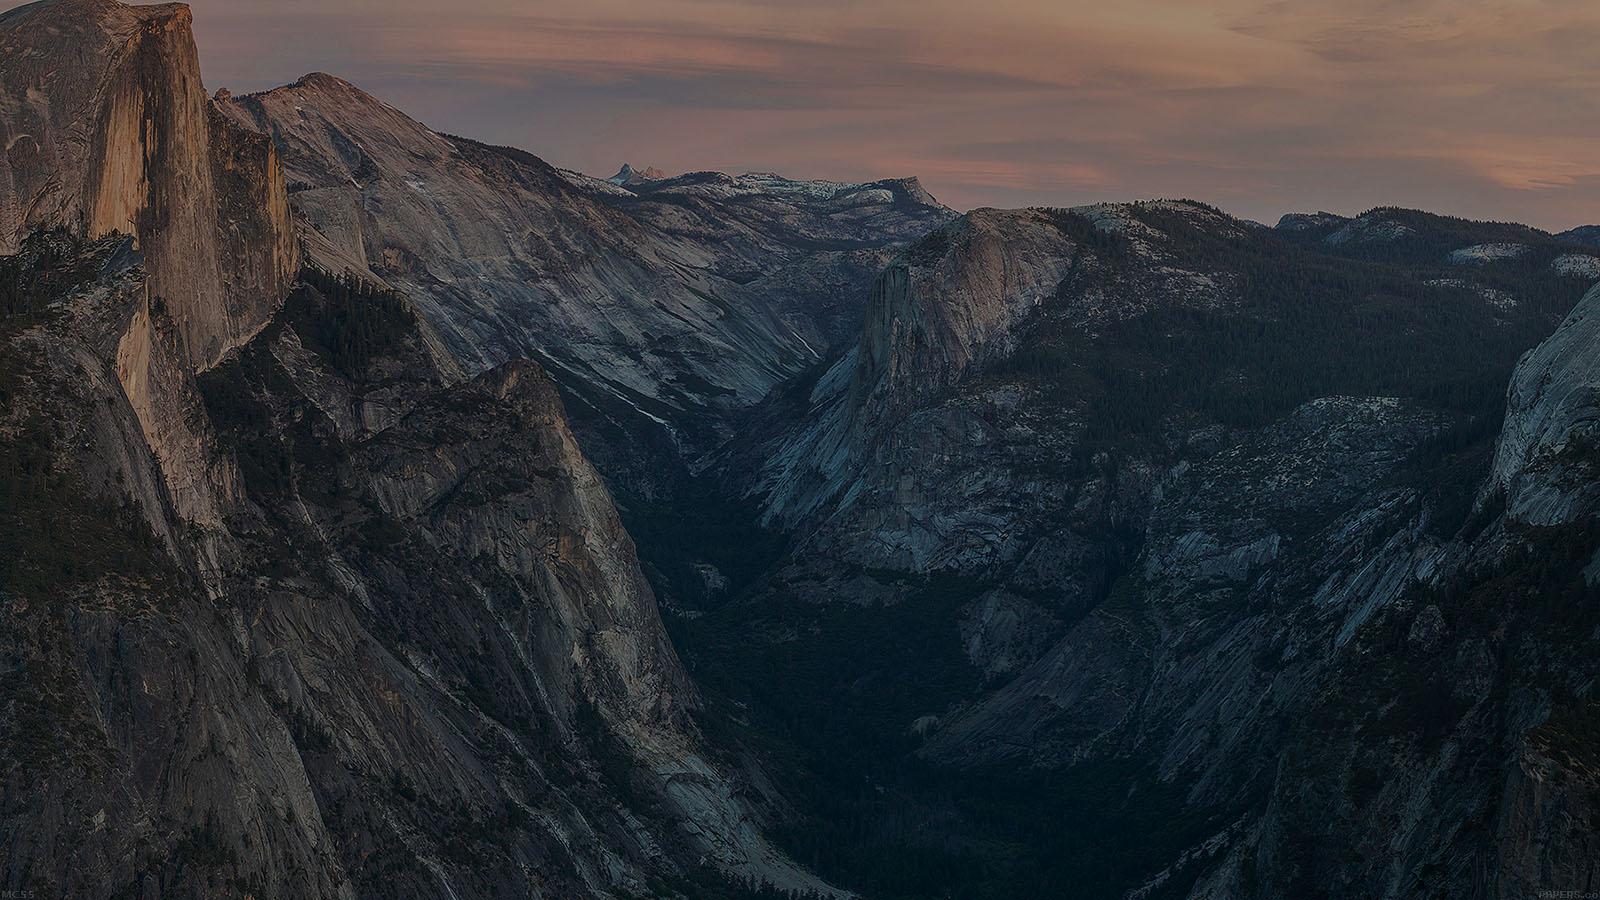 mc55-wallpaper-glacier-point-at-sunset-yosemite-dark-mountain - Papers.co